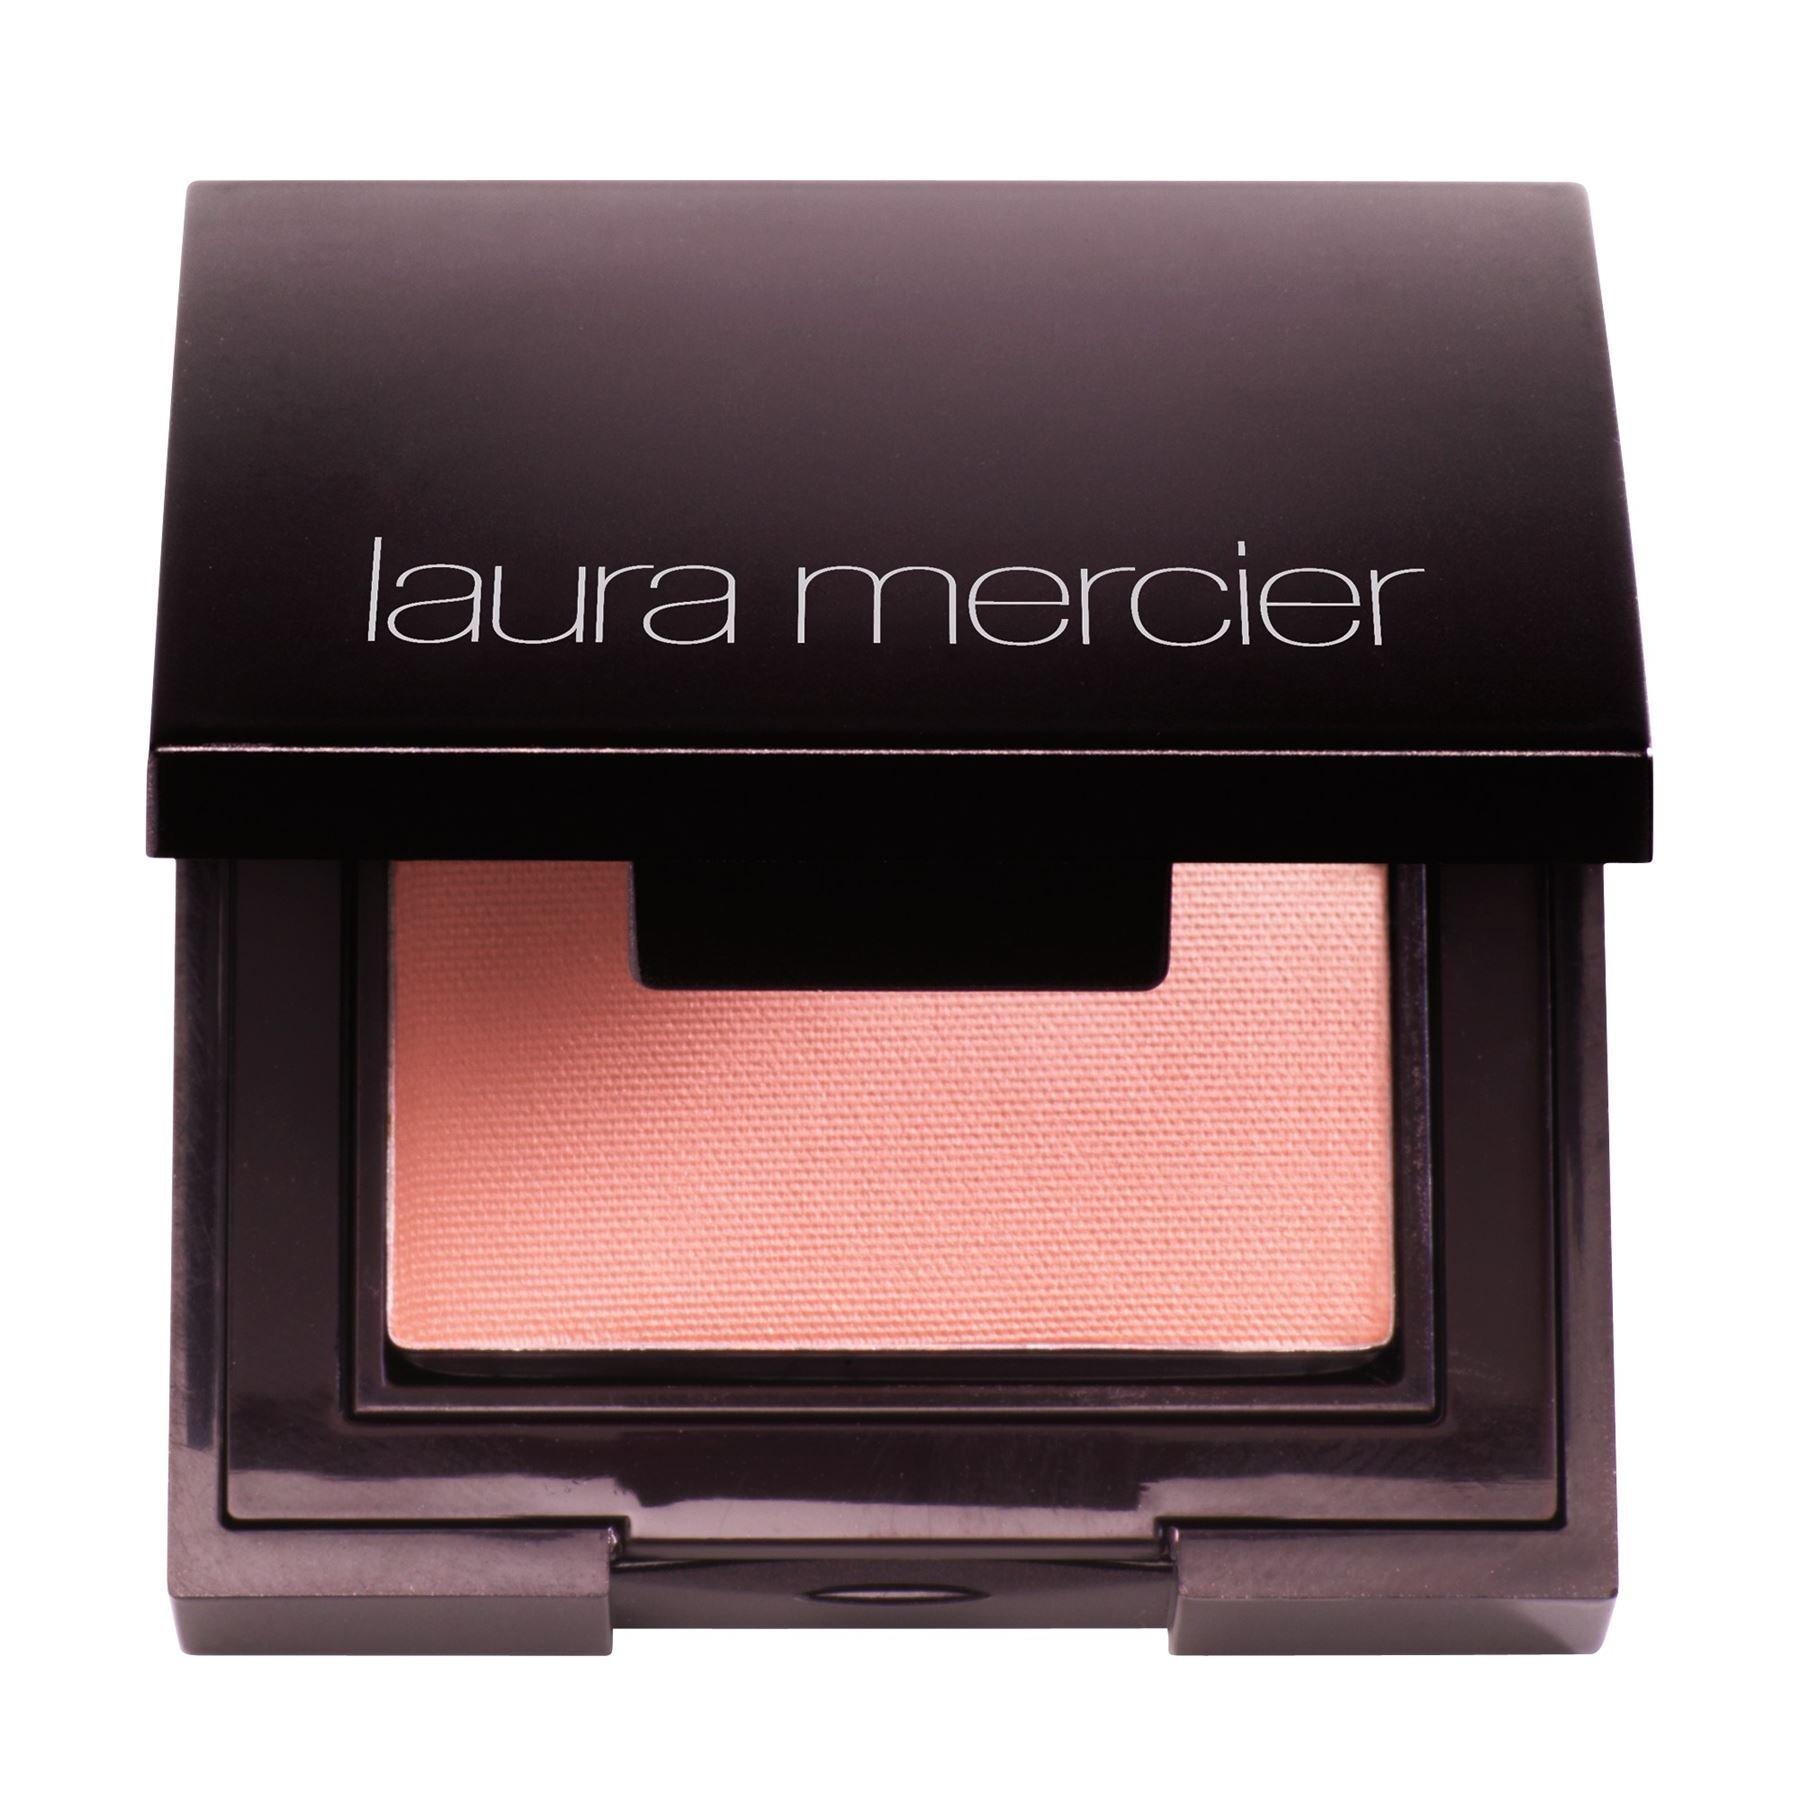 Laura Mercier Second Skin Cheek Colour Plum Radiance - Pack of 2